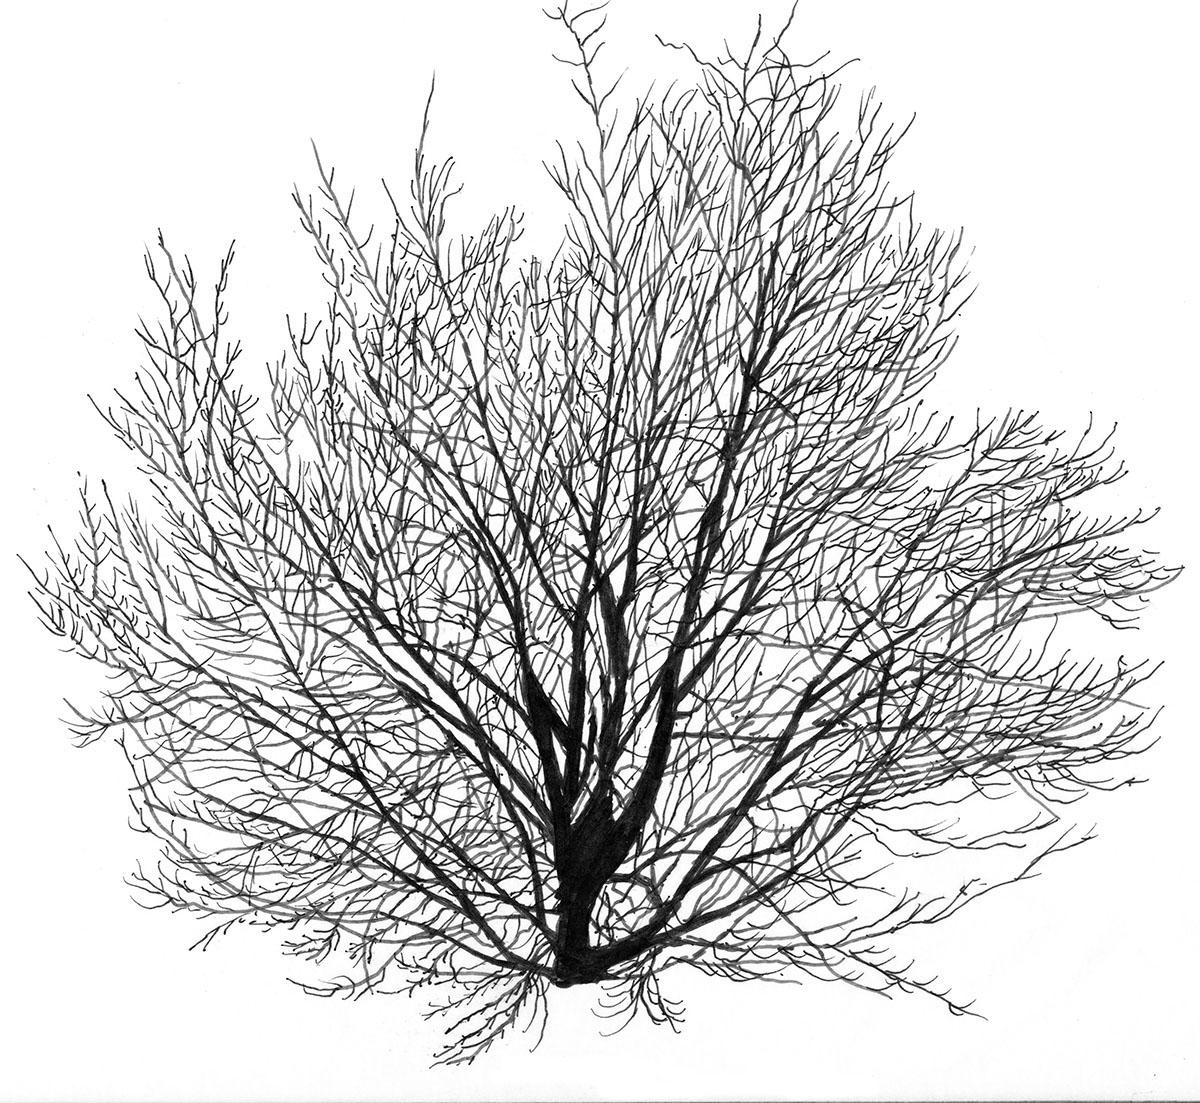 Figure 5. Leafless sketch of American Beech.